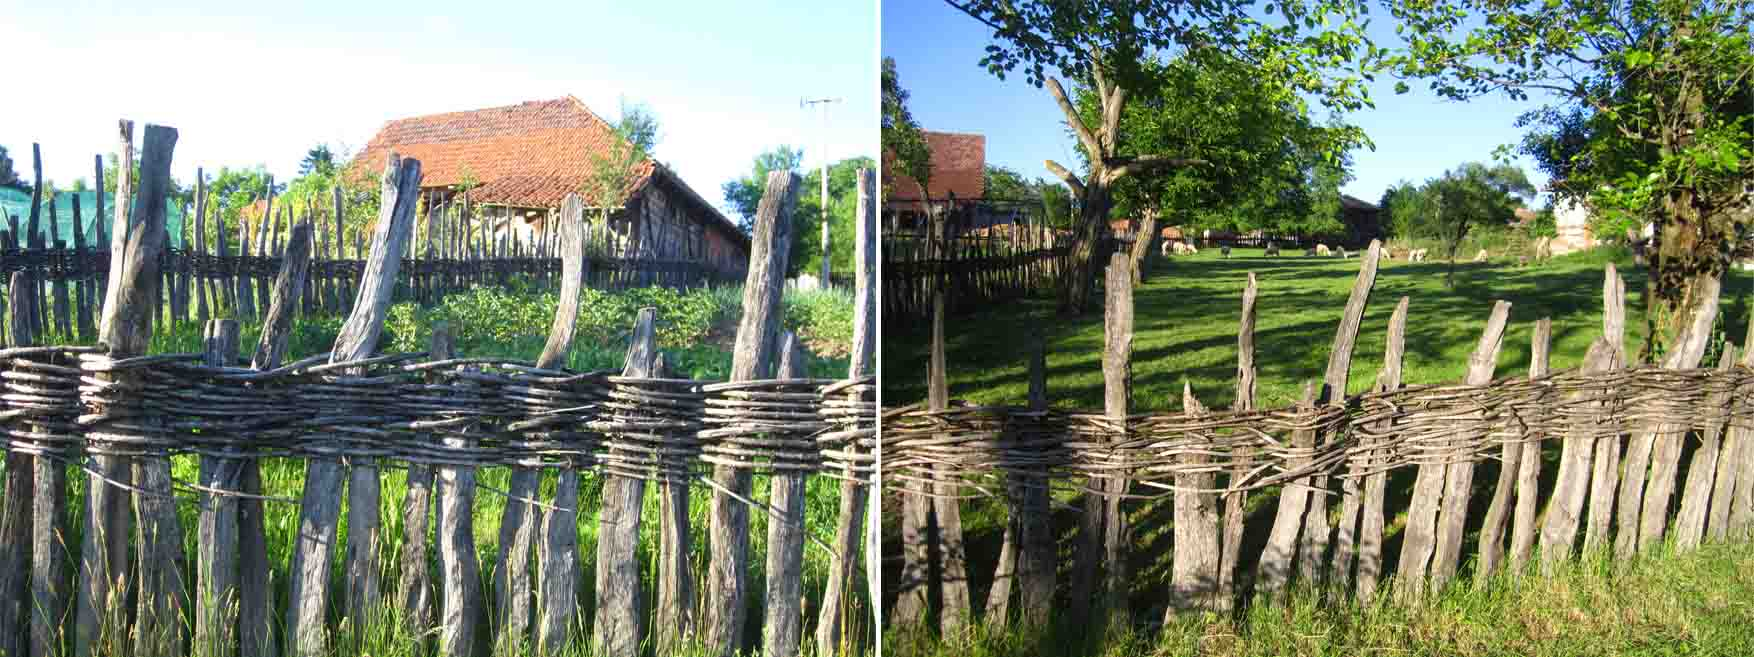 22 Draca radionica jun 2015 Dan2 seoske pletene ograde